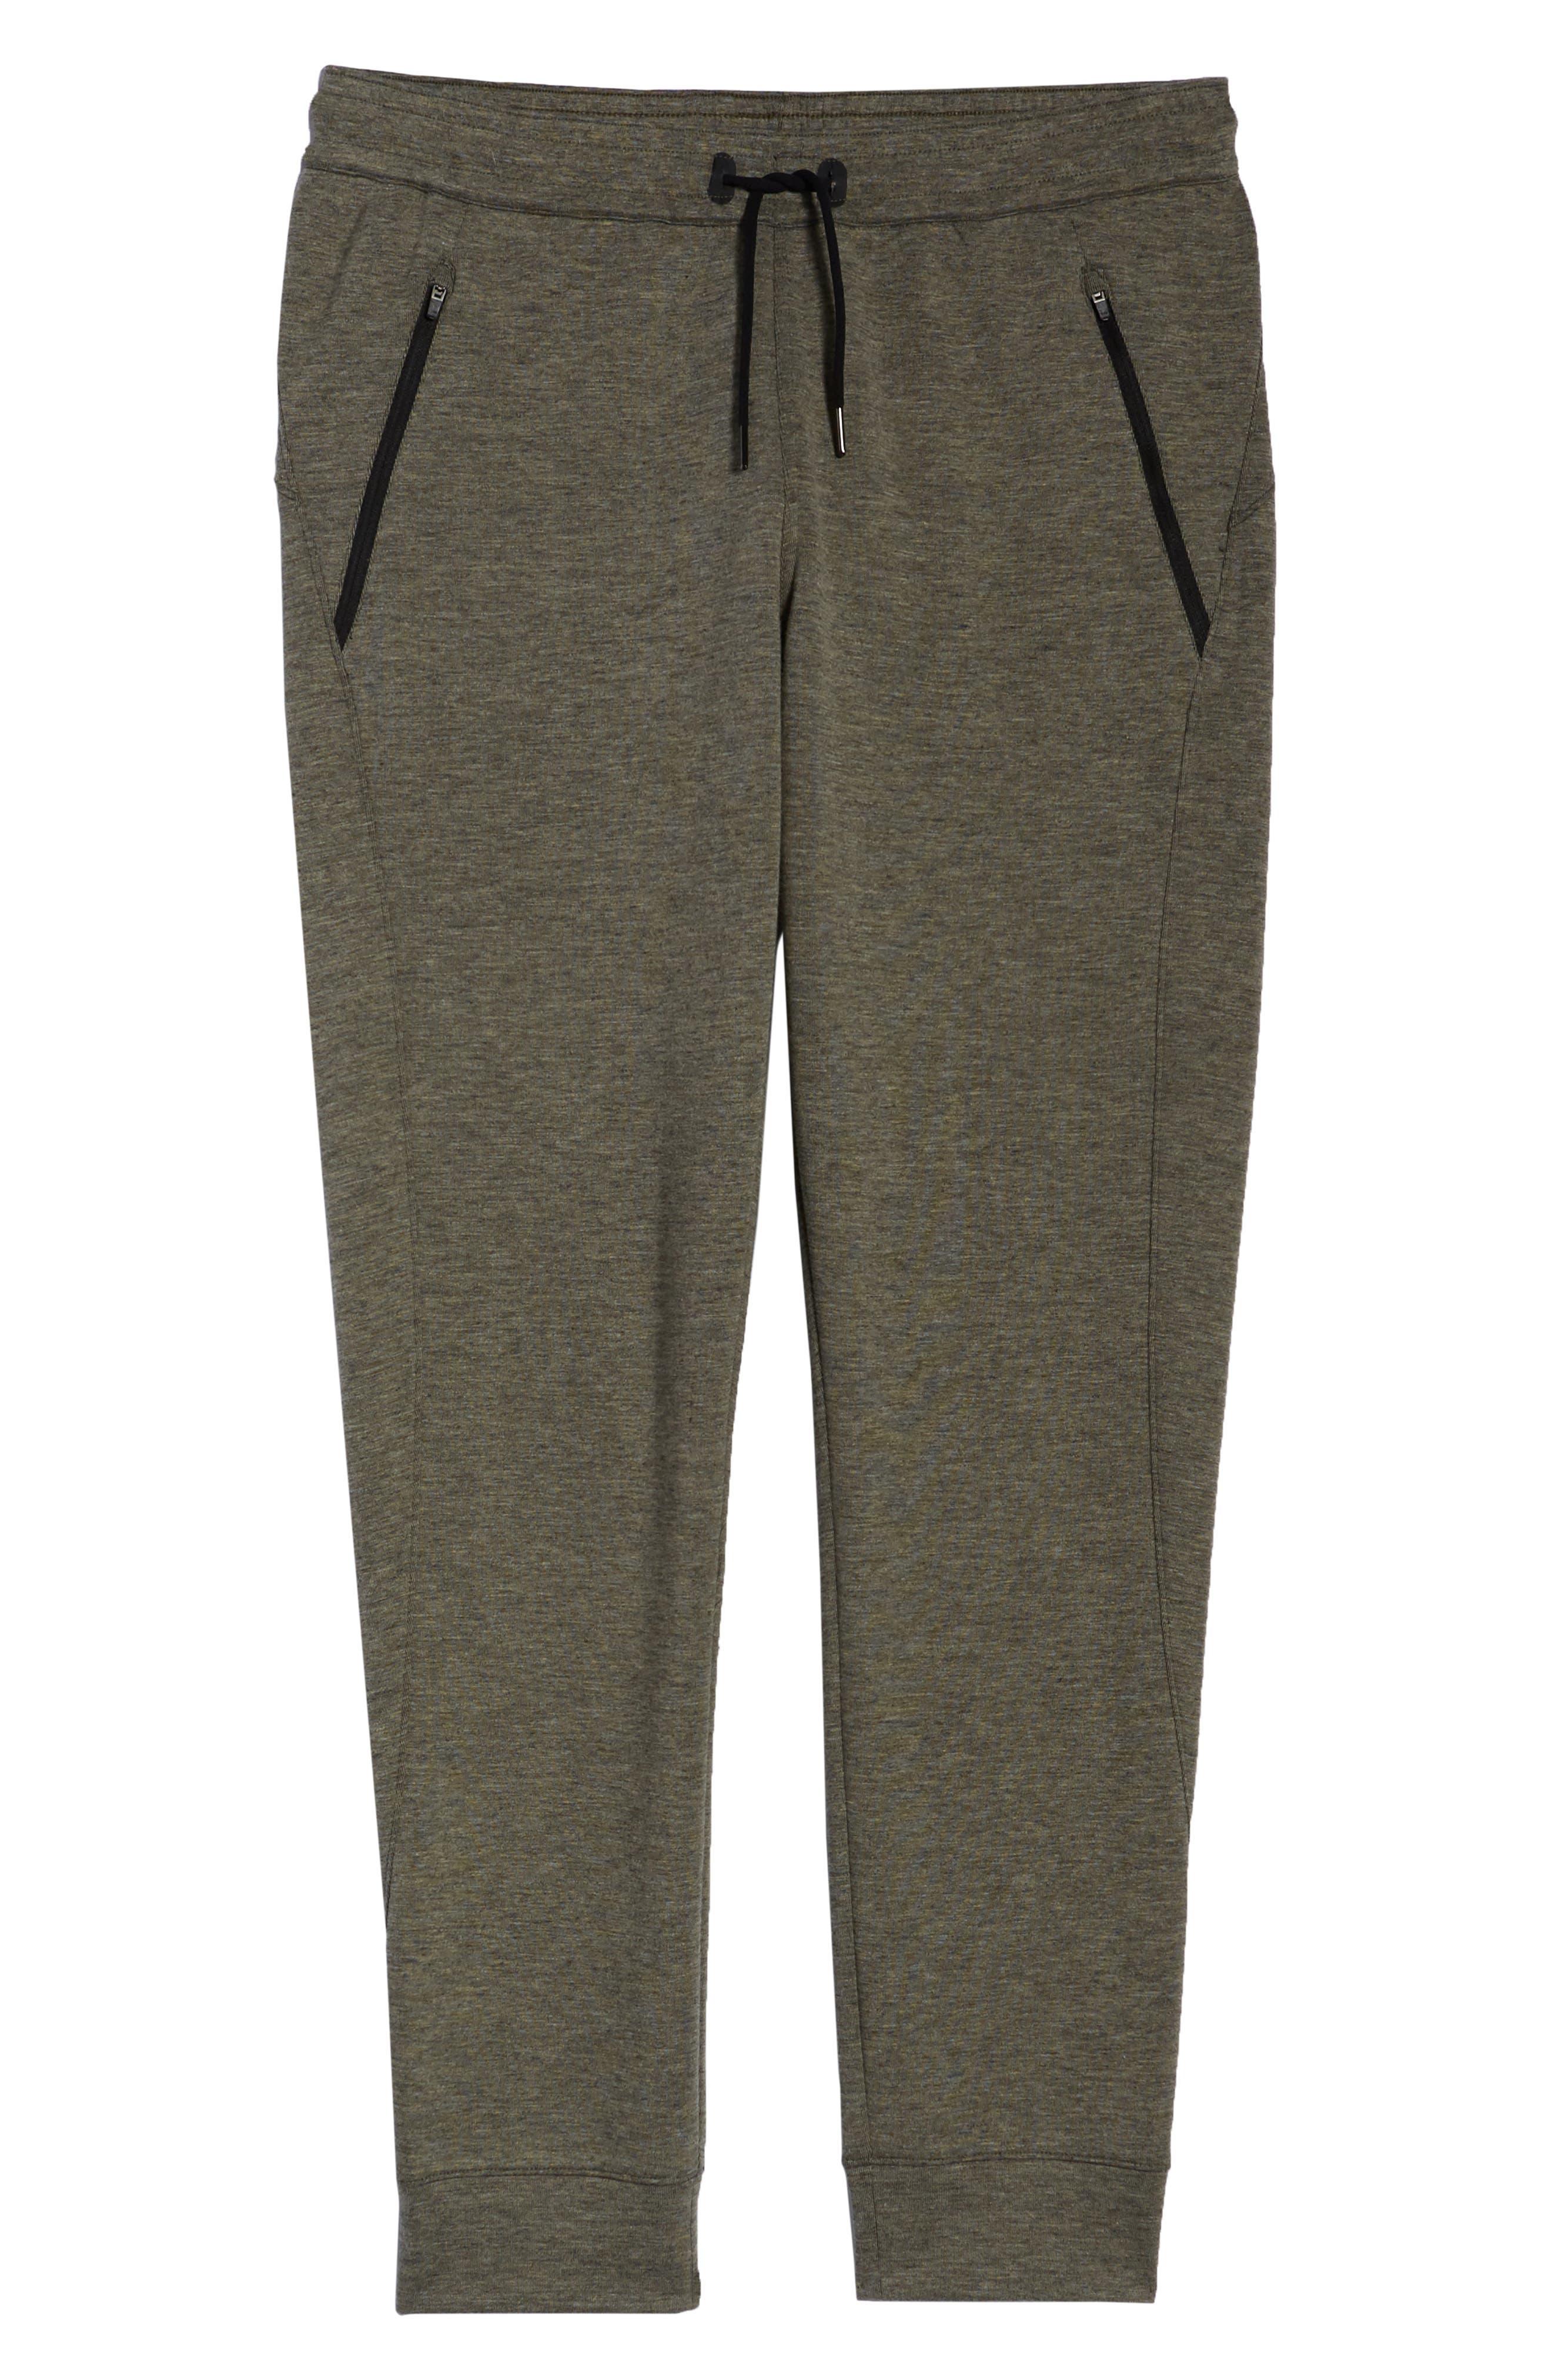 ZELLA, Magnetite Fleece Jogger Pants, Alternate thumbnail 7, color, GREEN VETIVER MELANGE